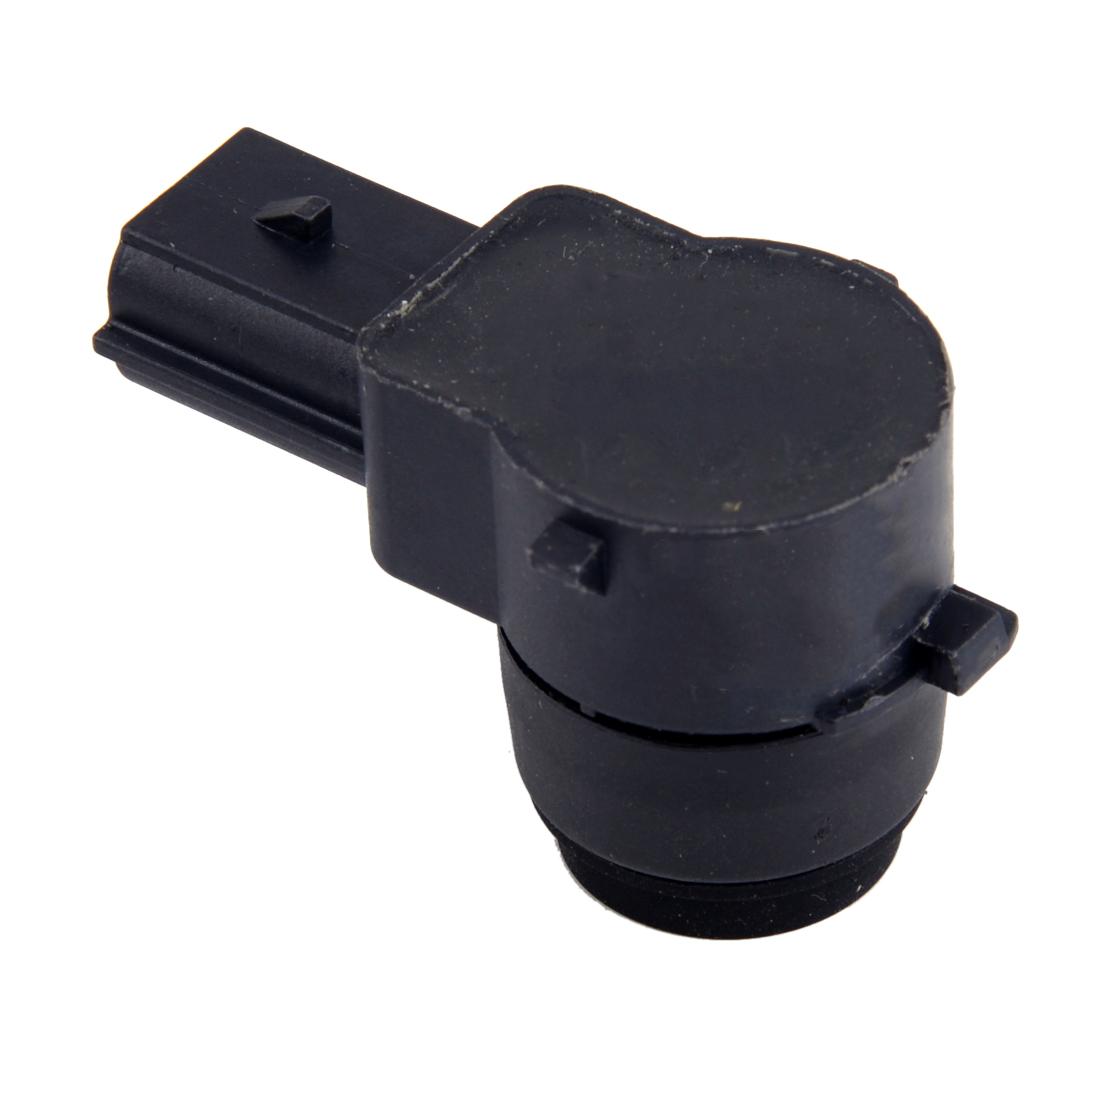 Parking Sensor 13242365 for GM Opel Astra Ampera Cascada